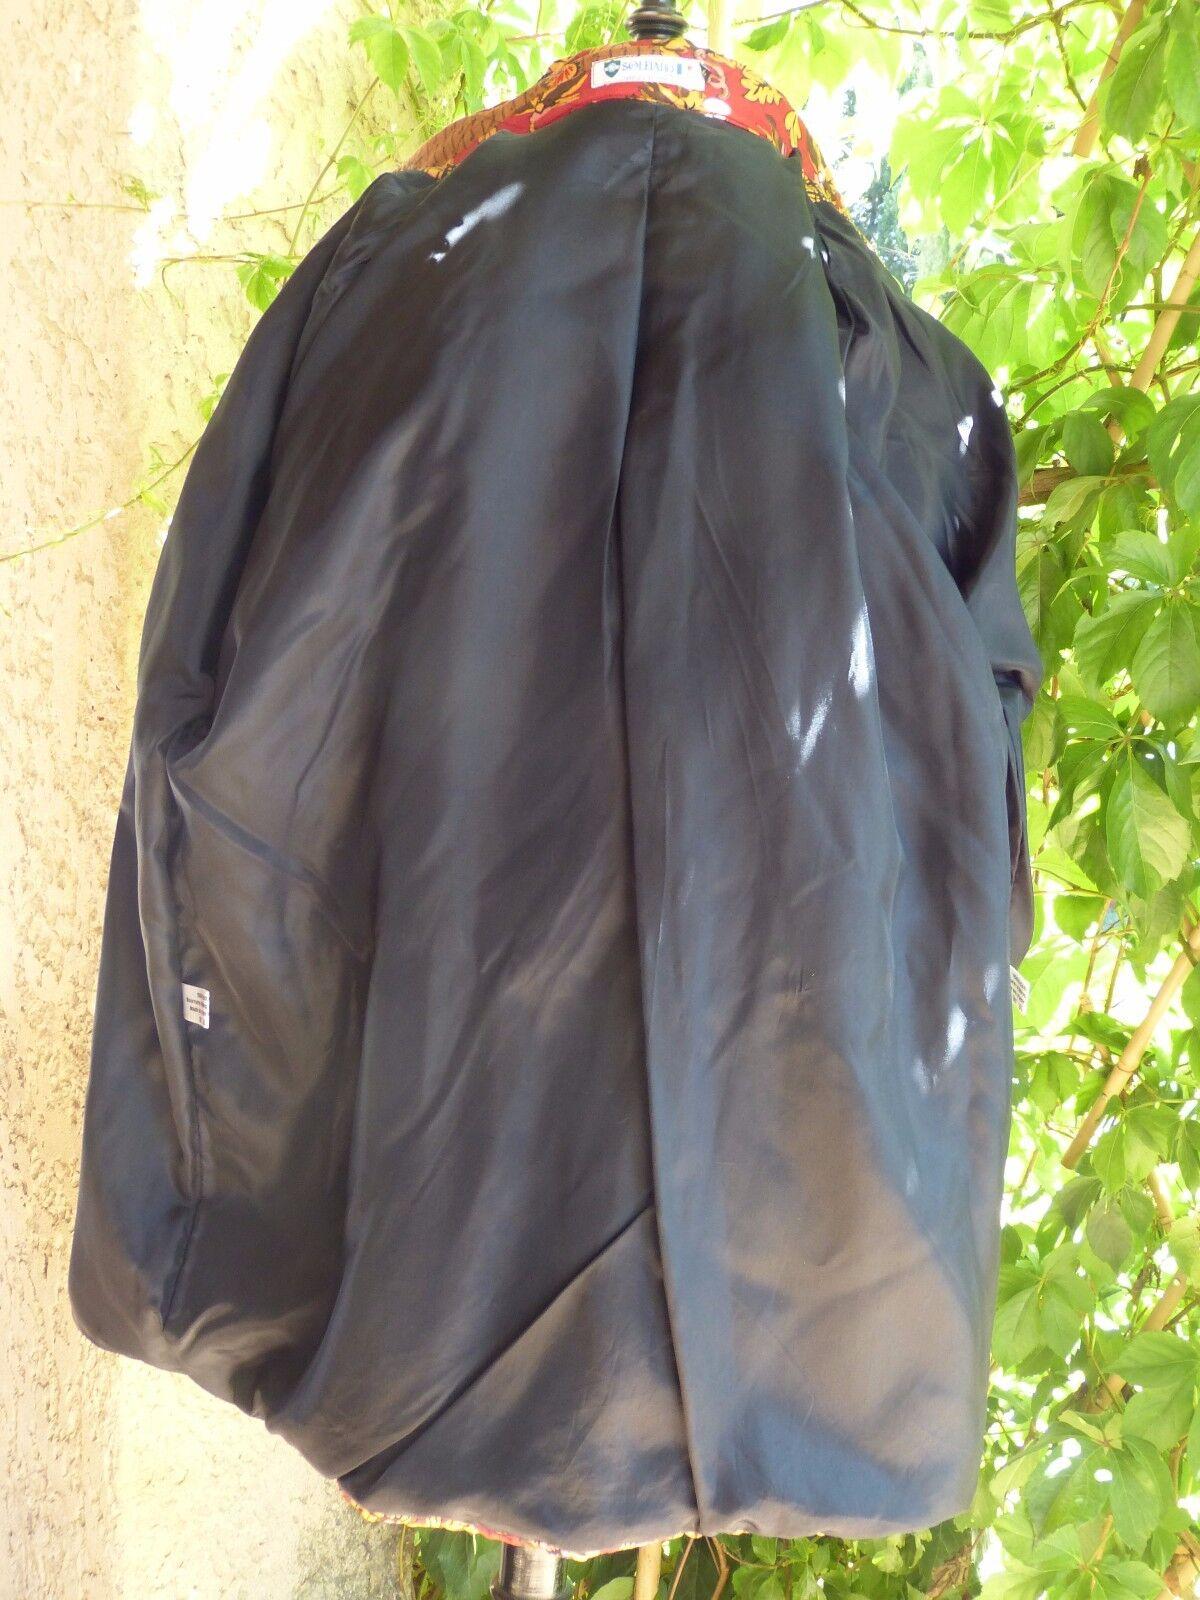 Worker Shirt Vintage Grigio Vintage Shirt HD Biker Chopper & oldschoolmotiv modello Scheletro Chopper d9fb04